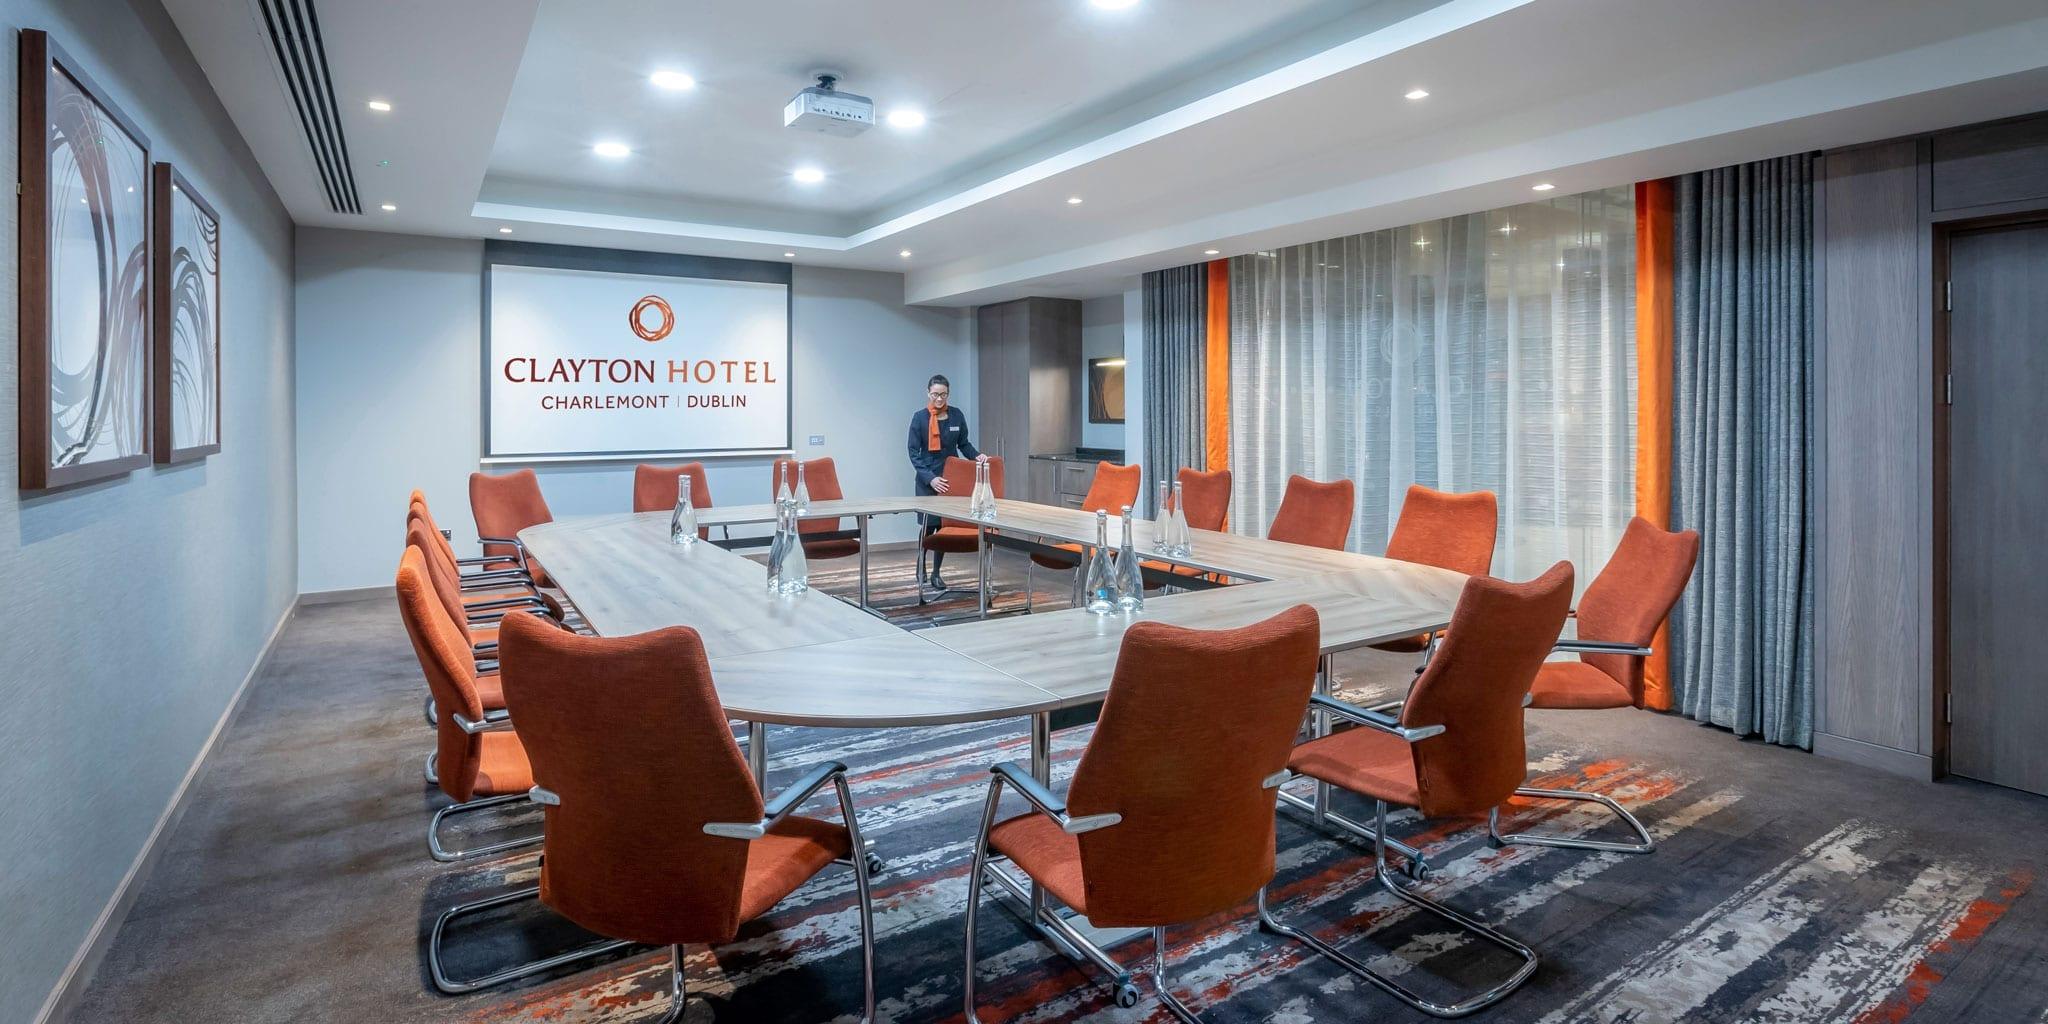 Hotel In Dublin City Centre 4 Star Clayton Hotel Charlemont D2